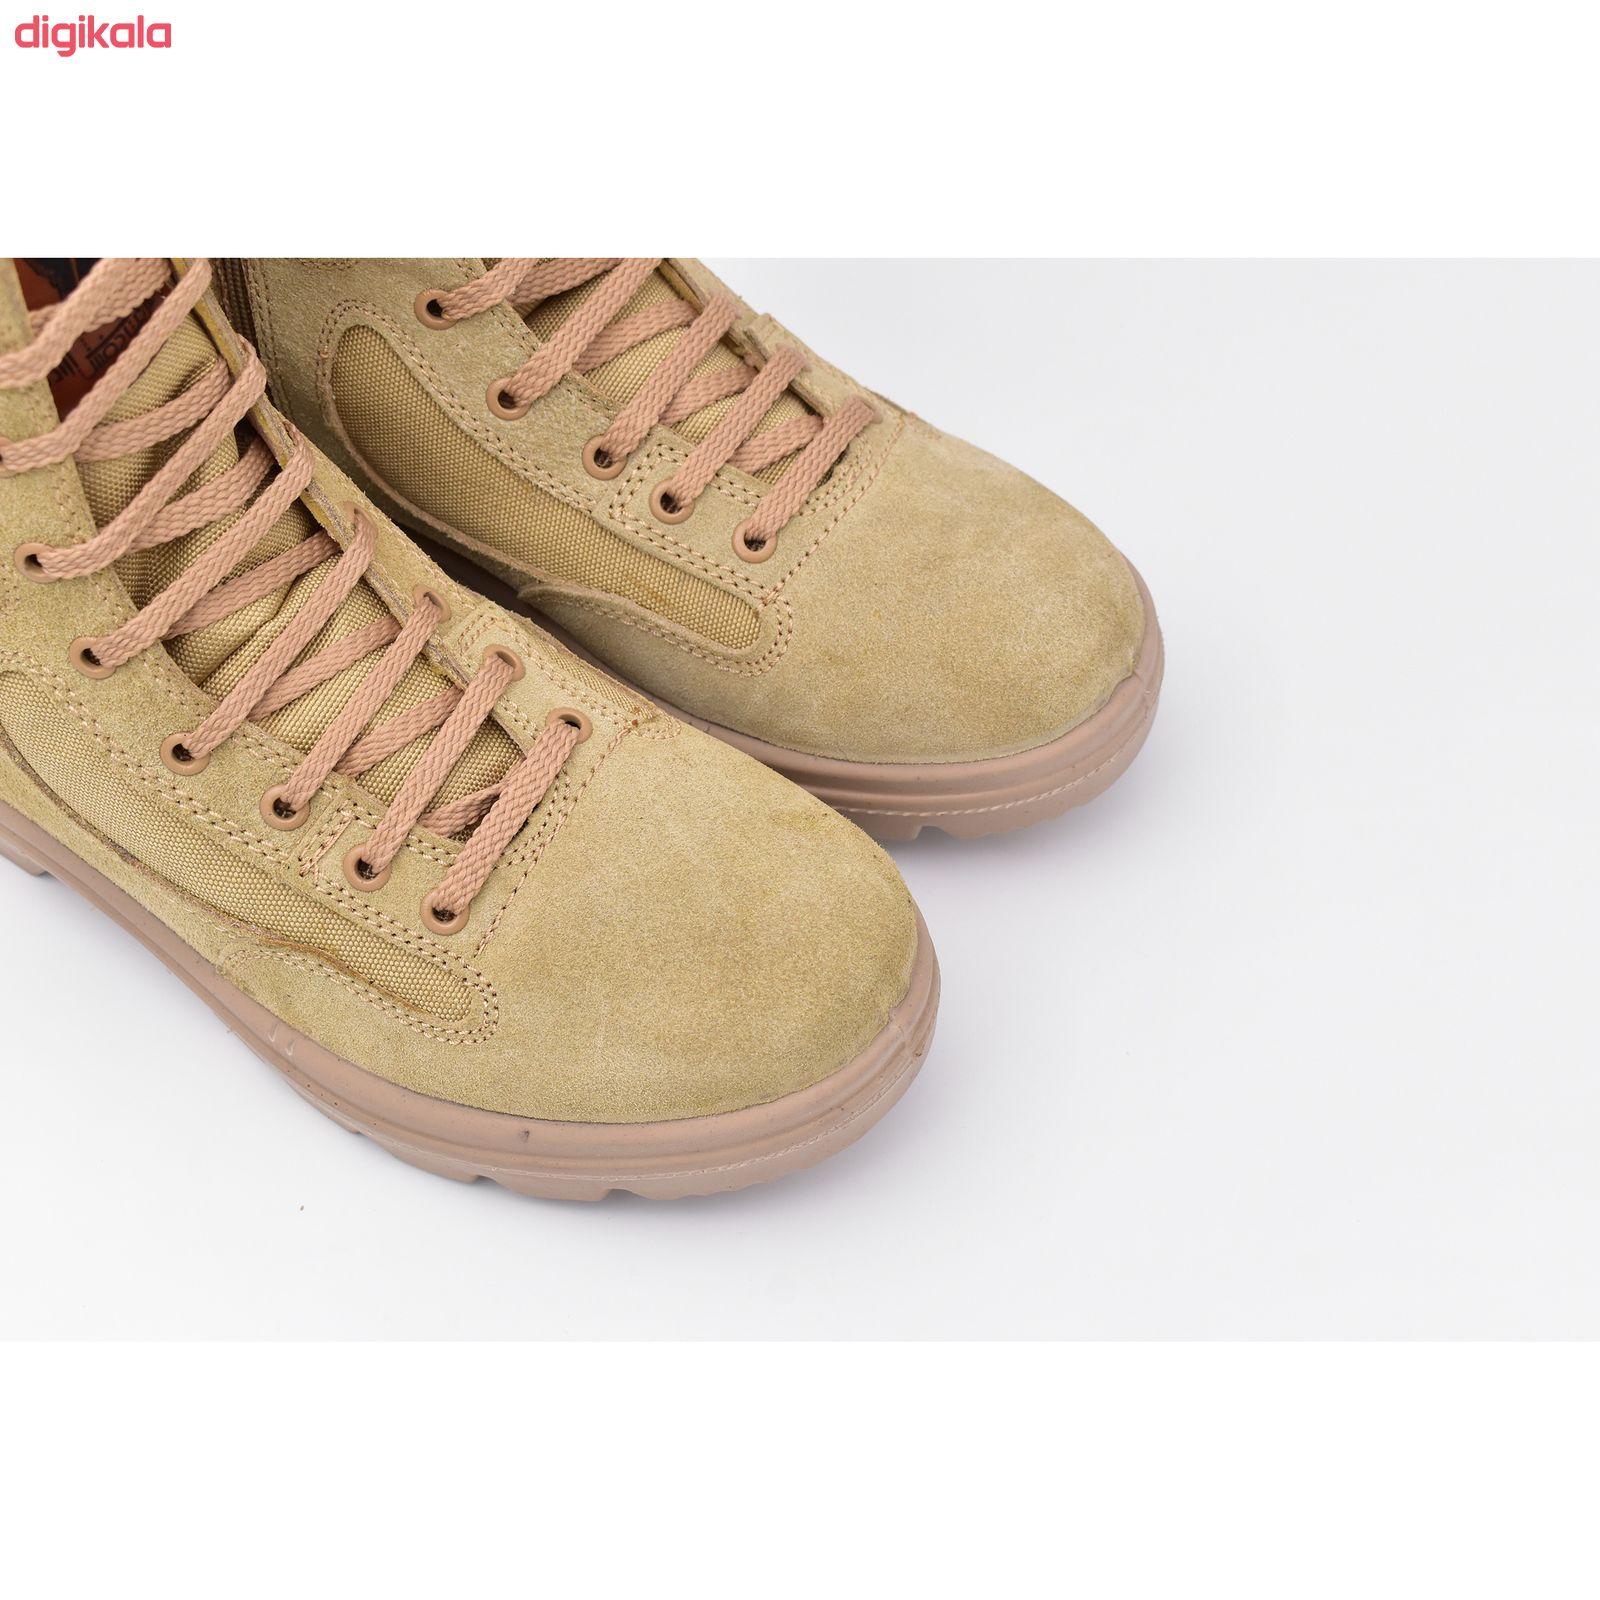 کفش کوهنوردی مردانه مدل Razm کد 8485 main 1 4